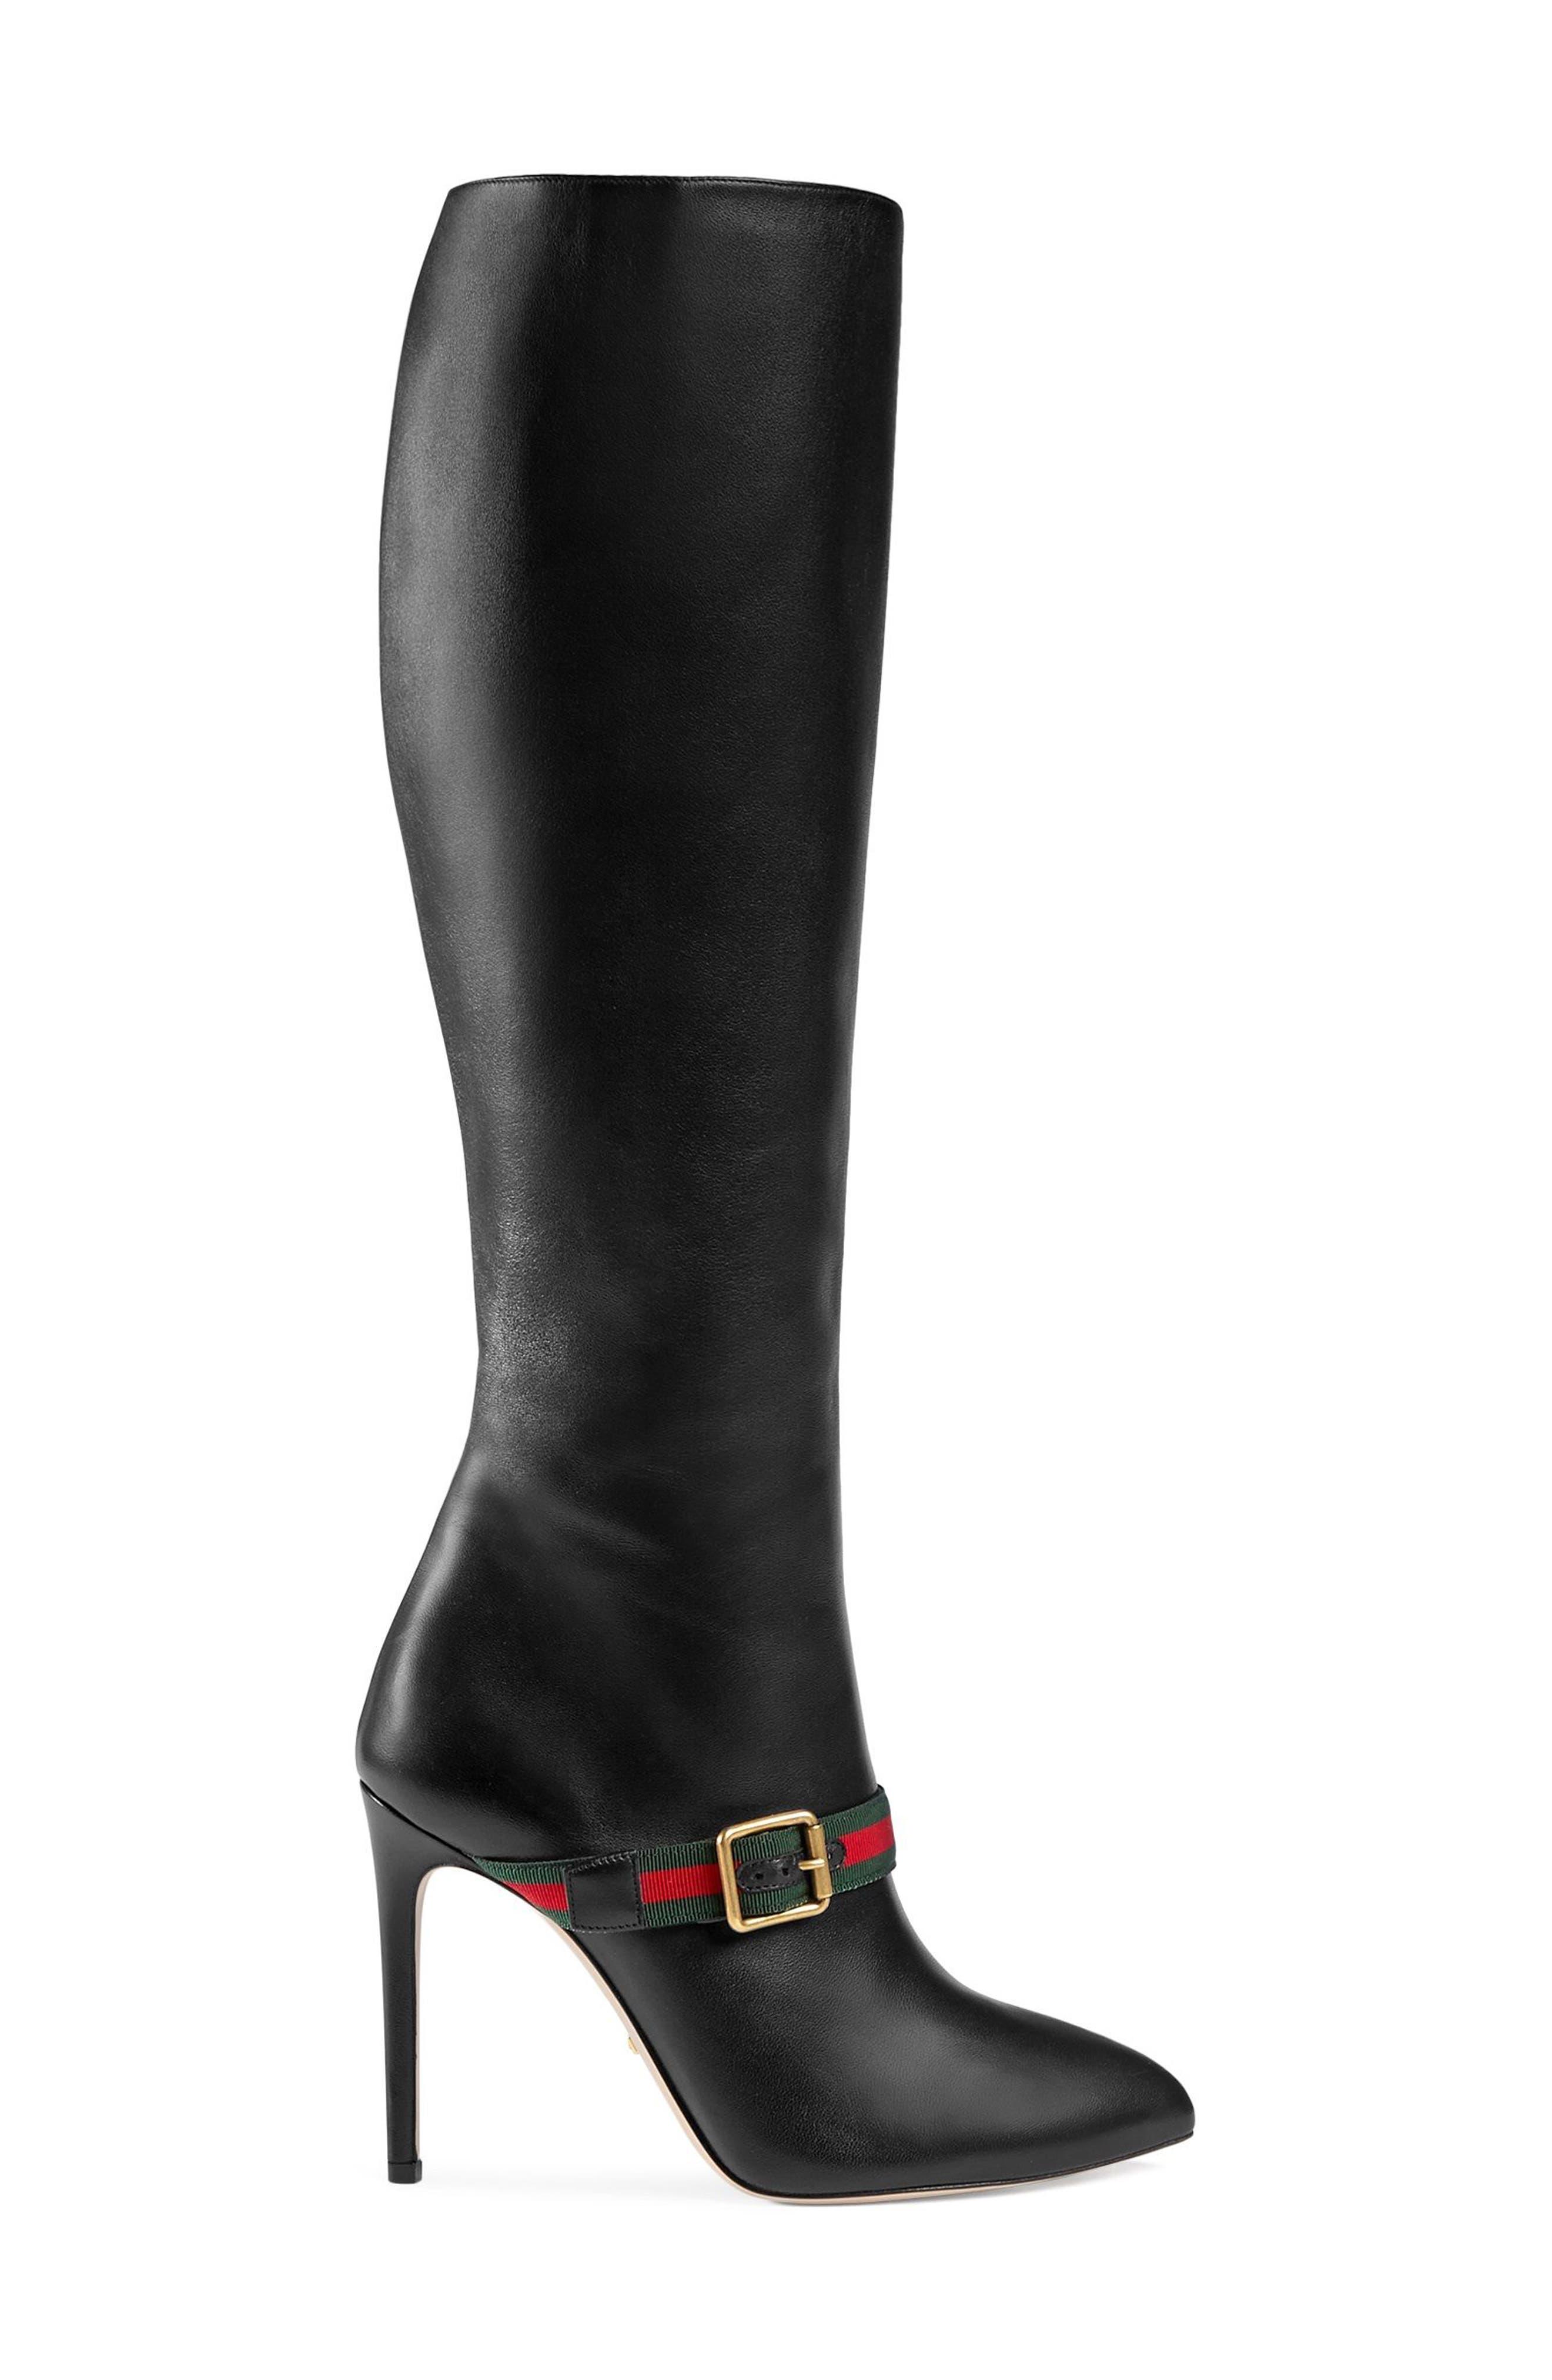 Main Image - Gucci Sylvie Strap Tall Boot (Women)